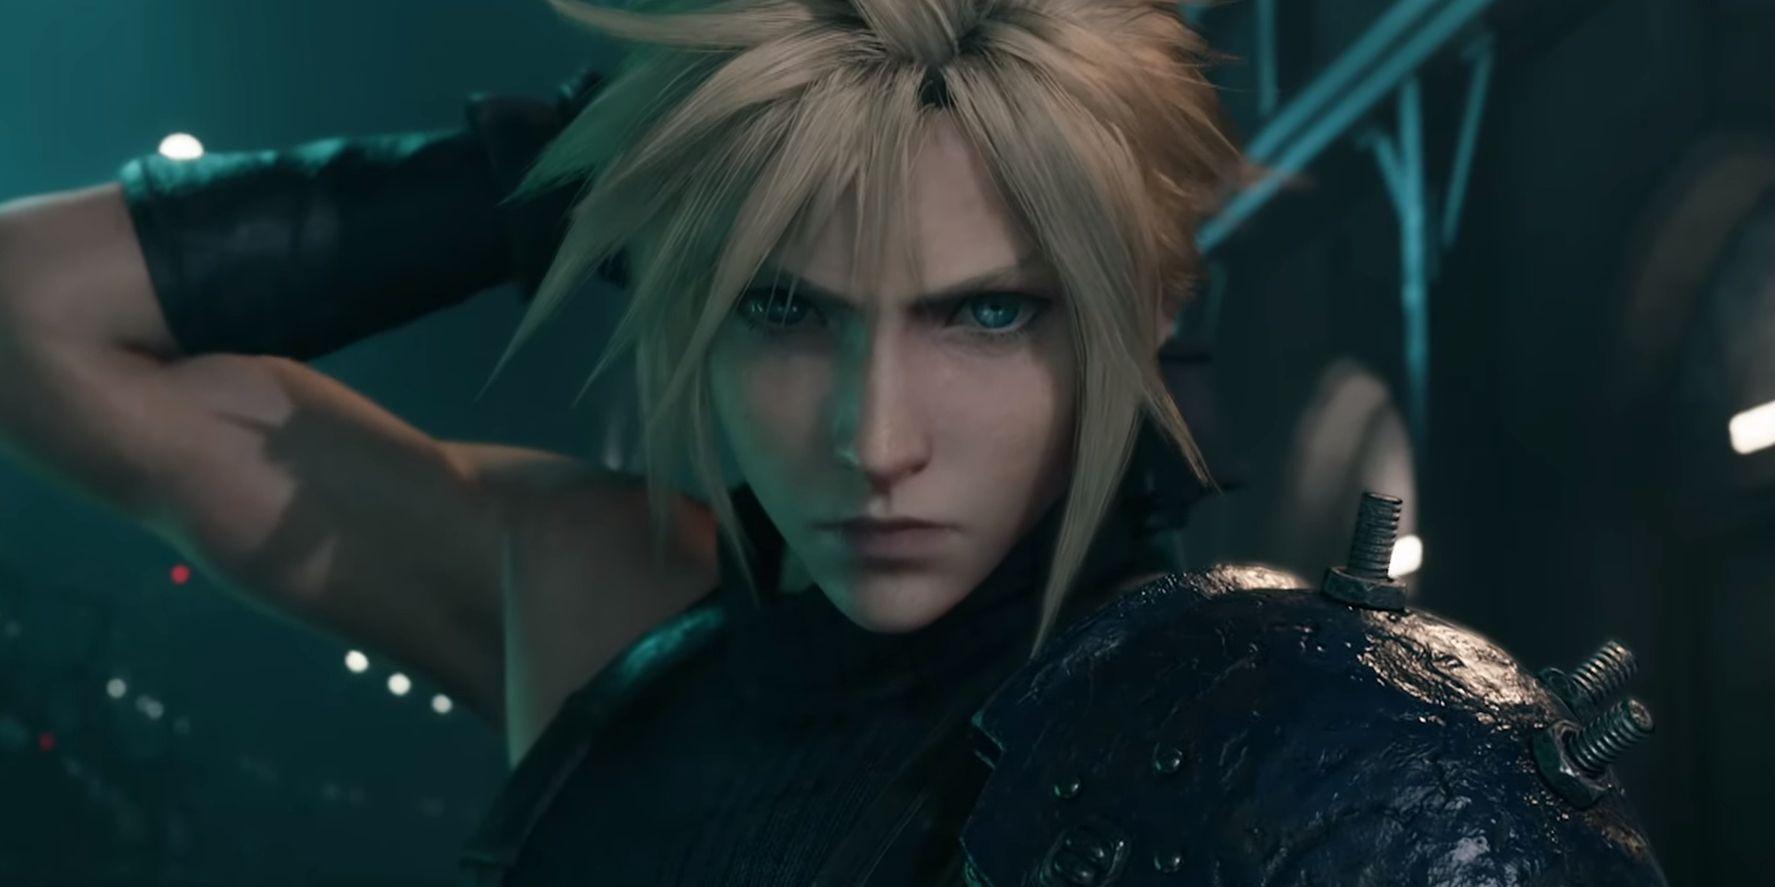 Final Fantasy Film Trailer